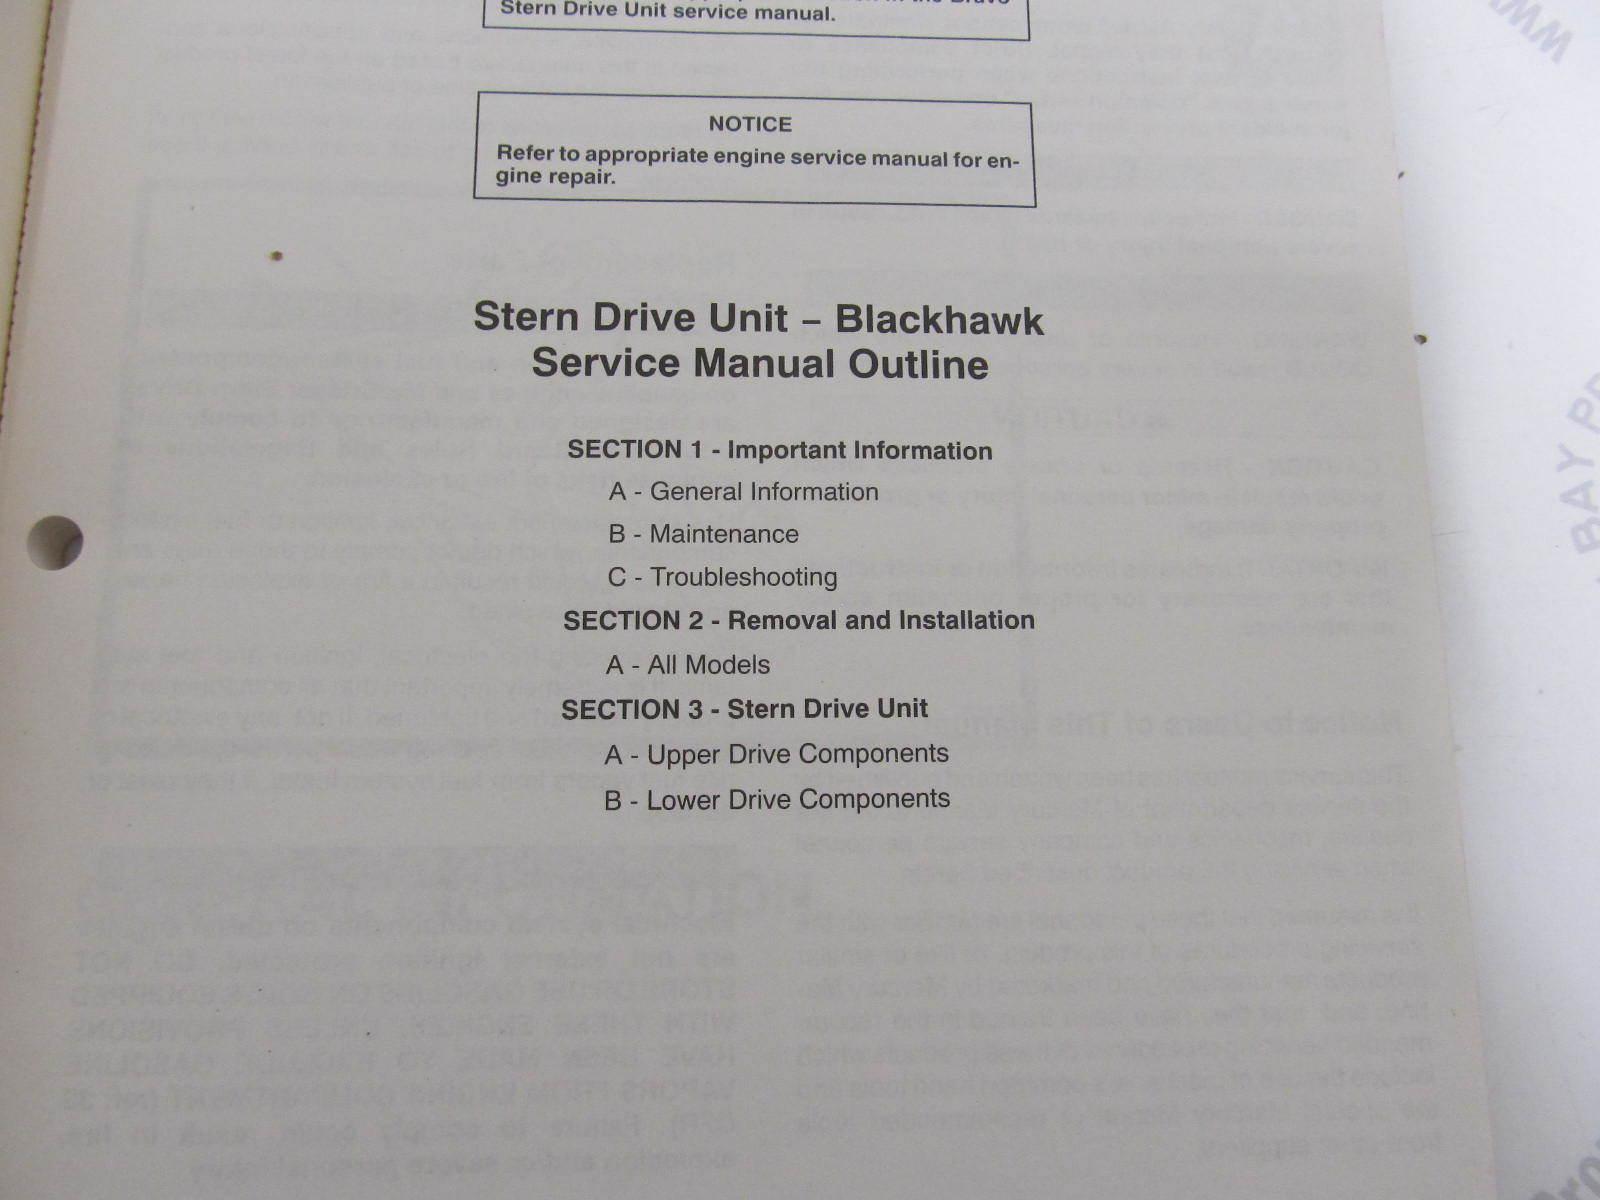 ... 90-823228 694 MerCruiser Blackhawk Stern Drive Service Manual #20 ...